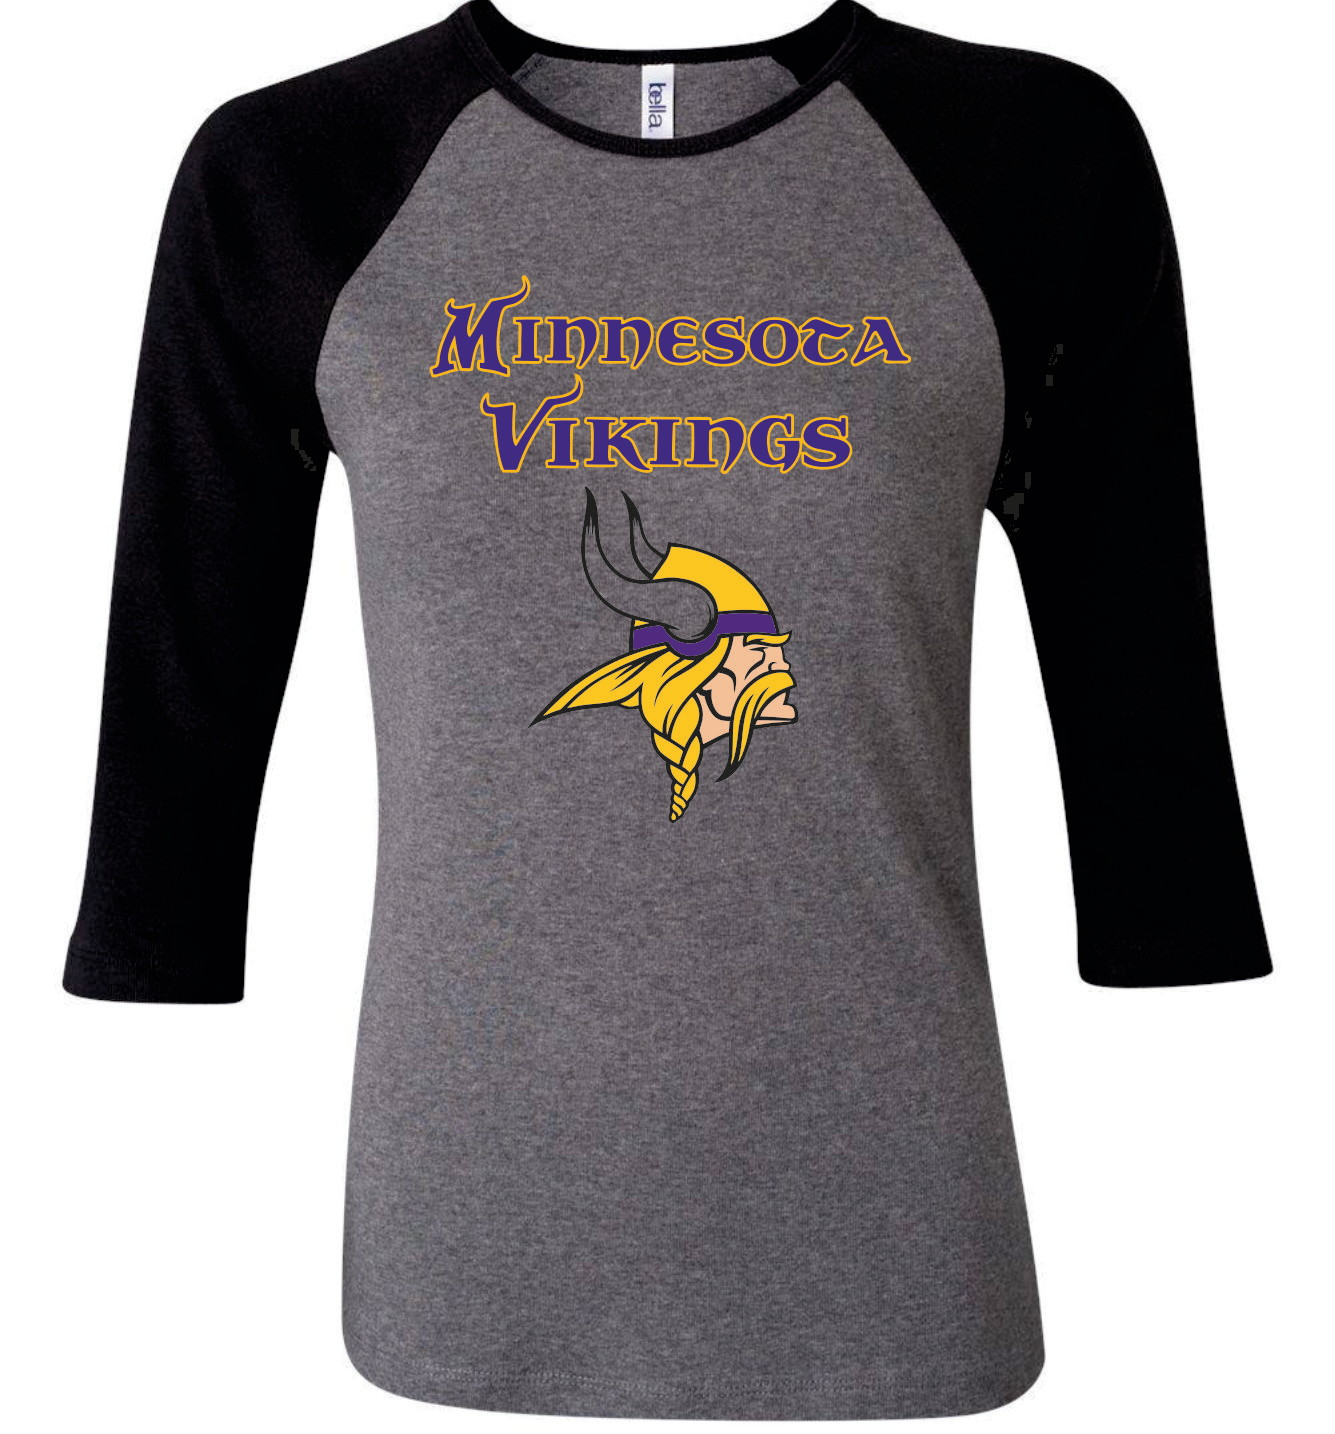 a39cb573d Camiseta Minnesota Vikings Nfl A3